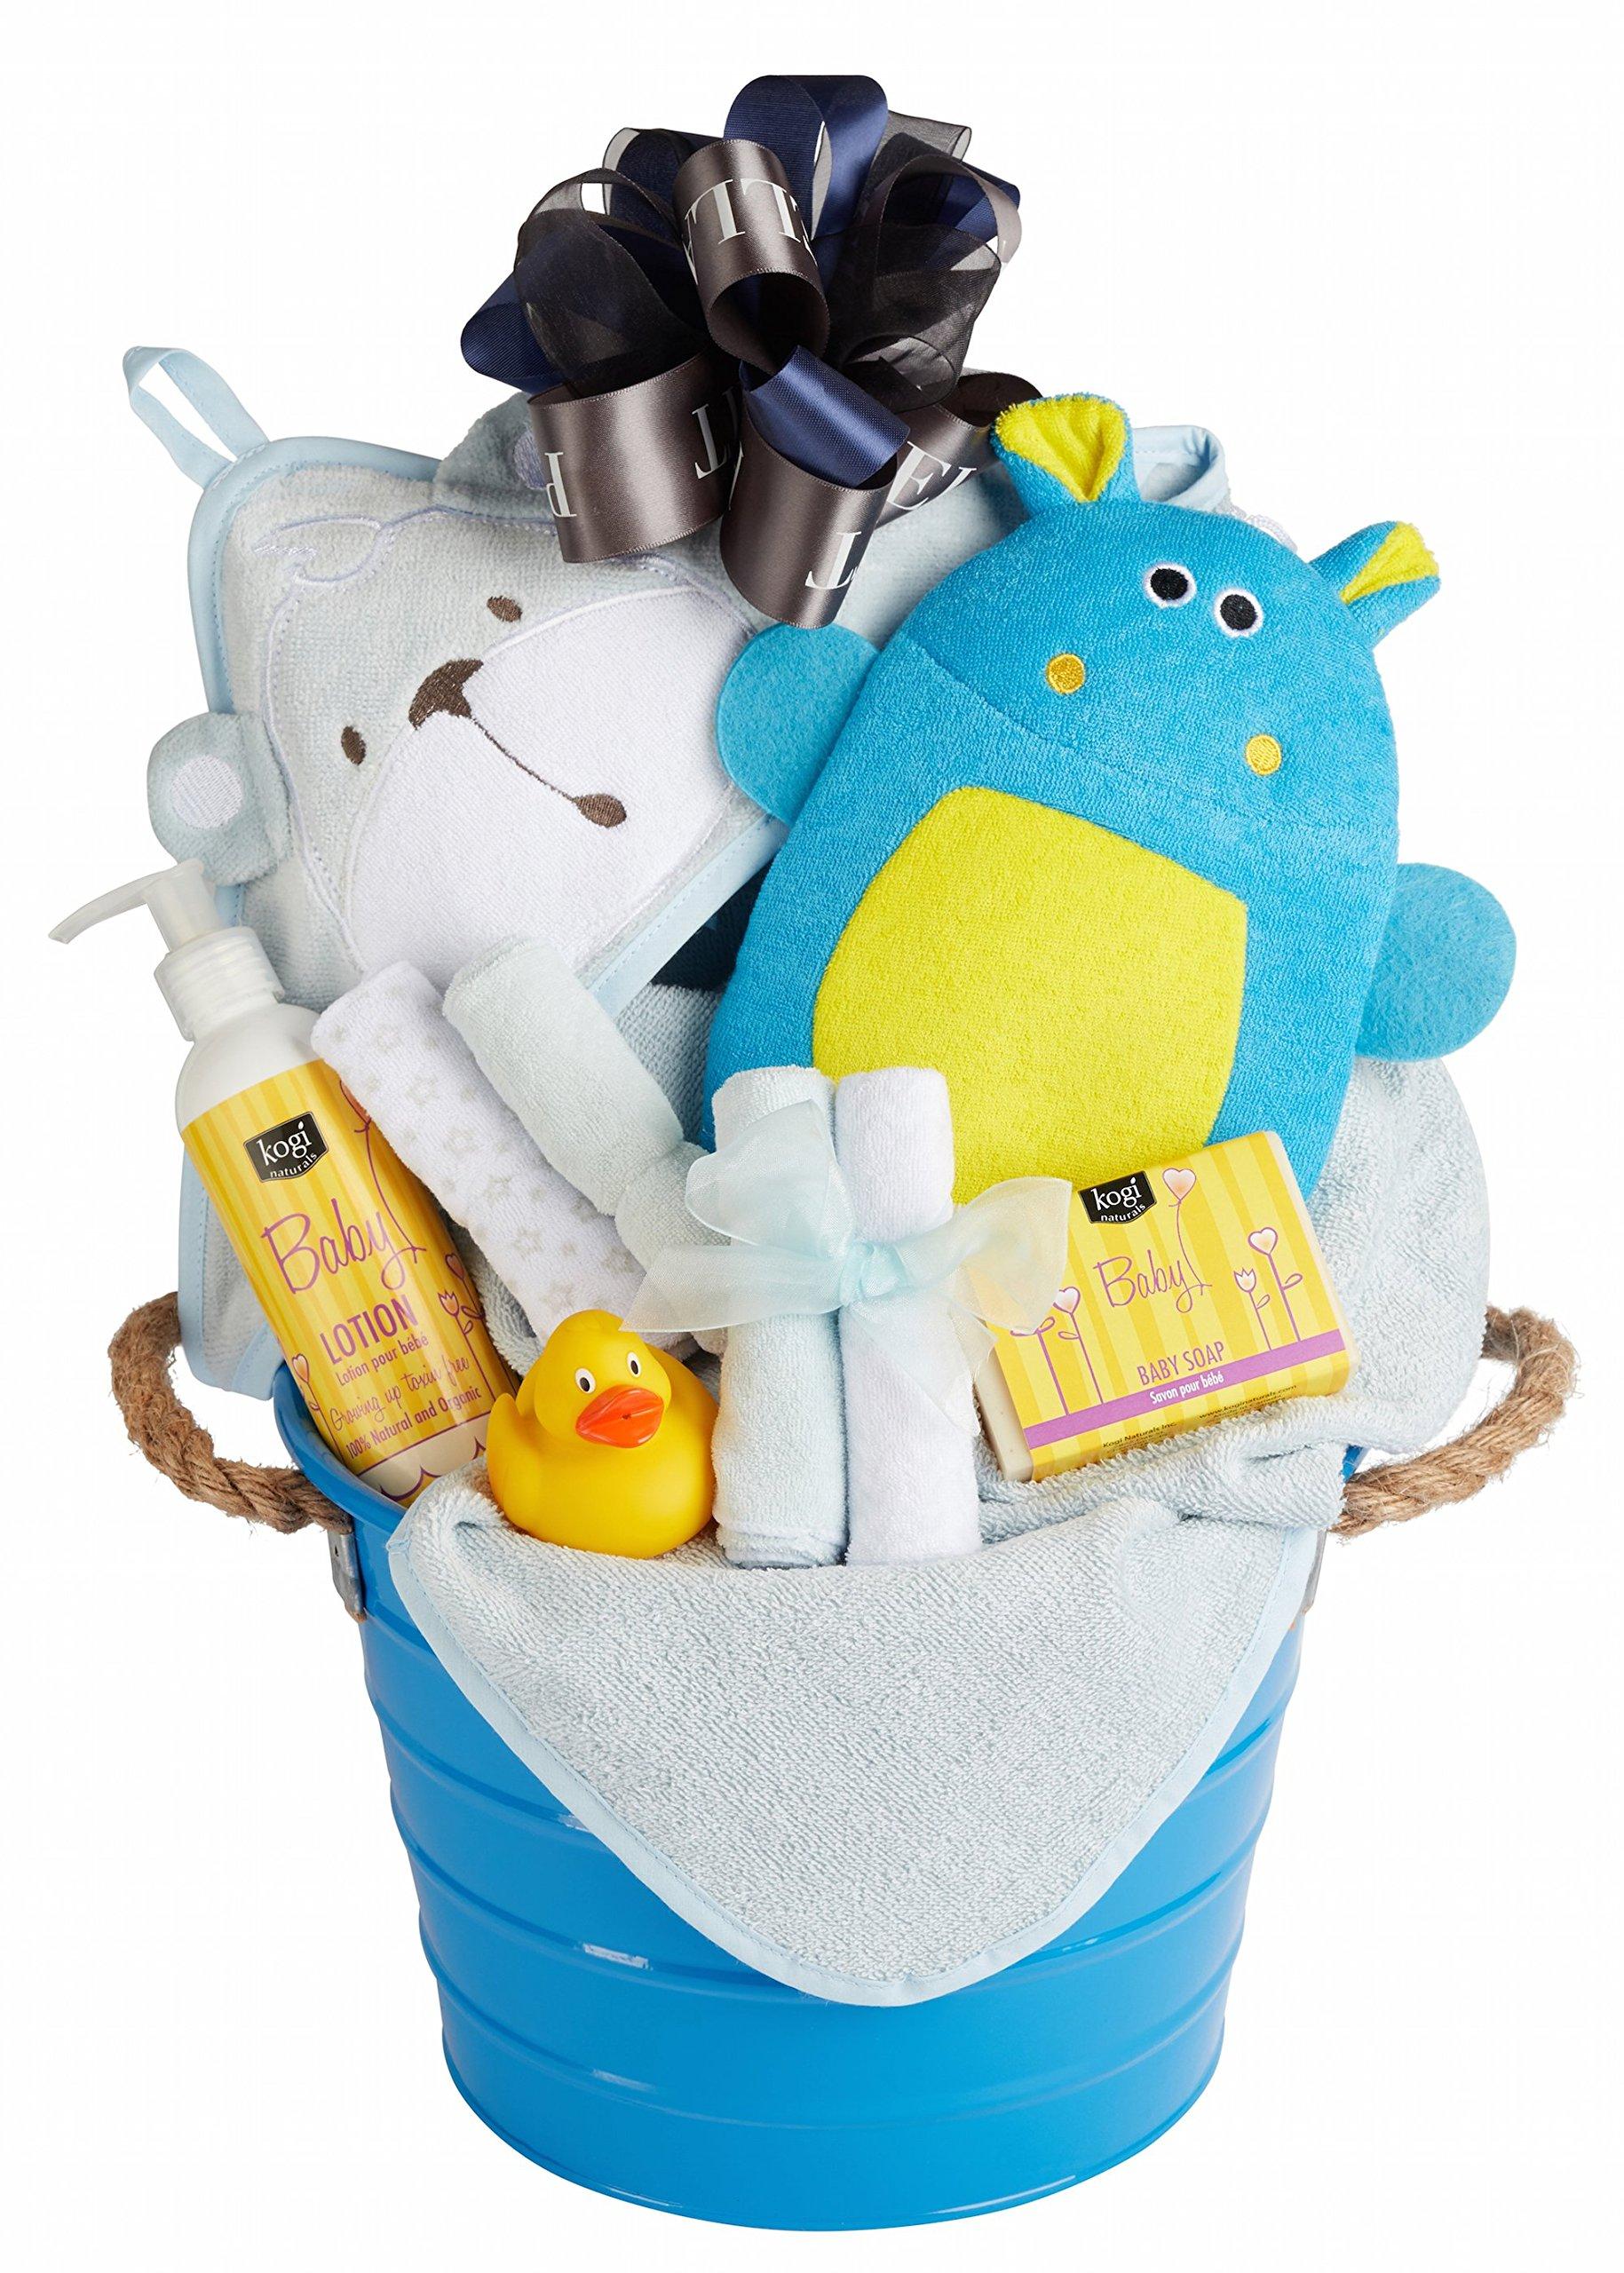 Newborn Baby Boy Bath Basket with Hooded Towel, Washcloths, Organic Soap and Lotion